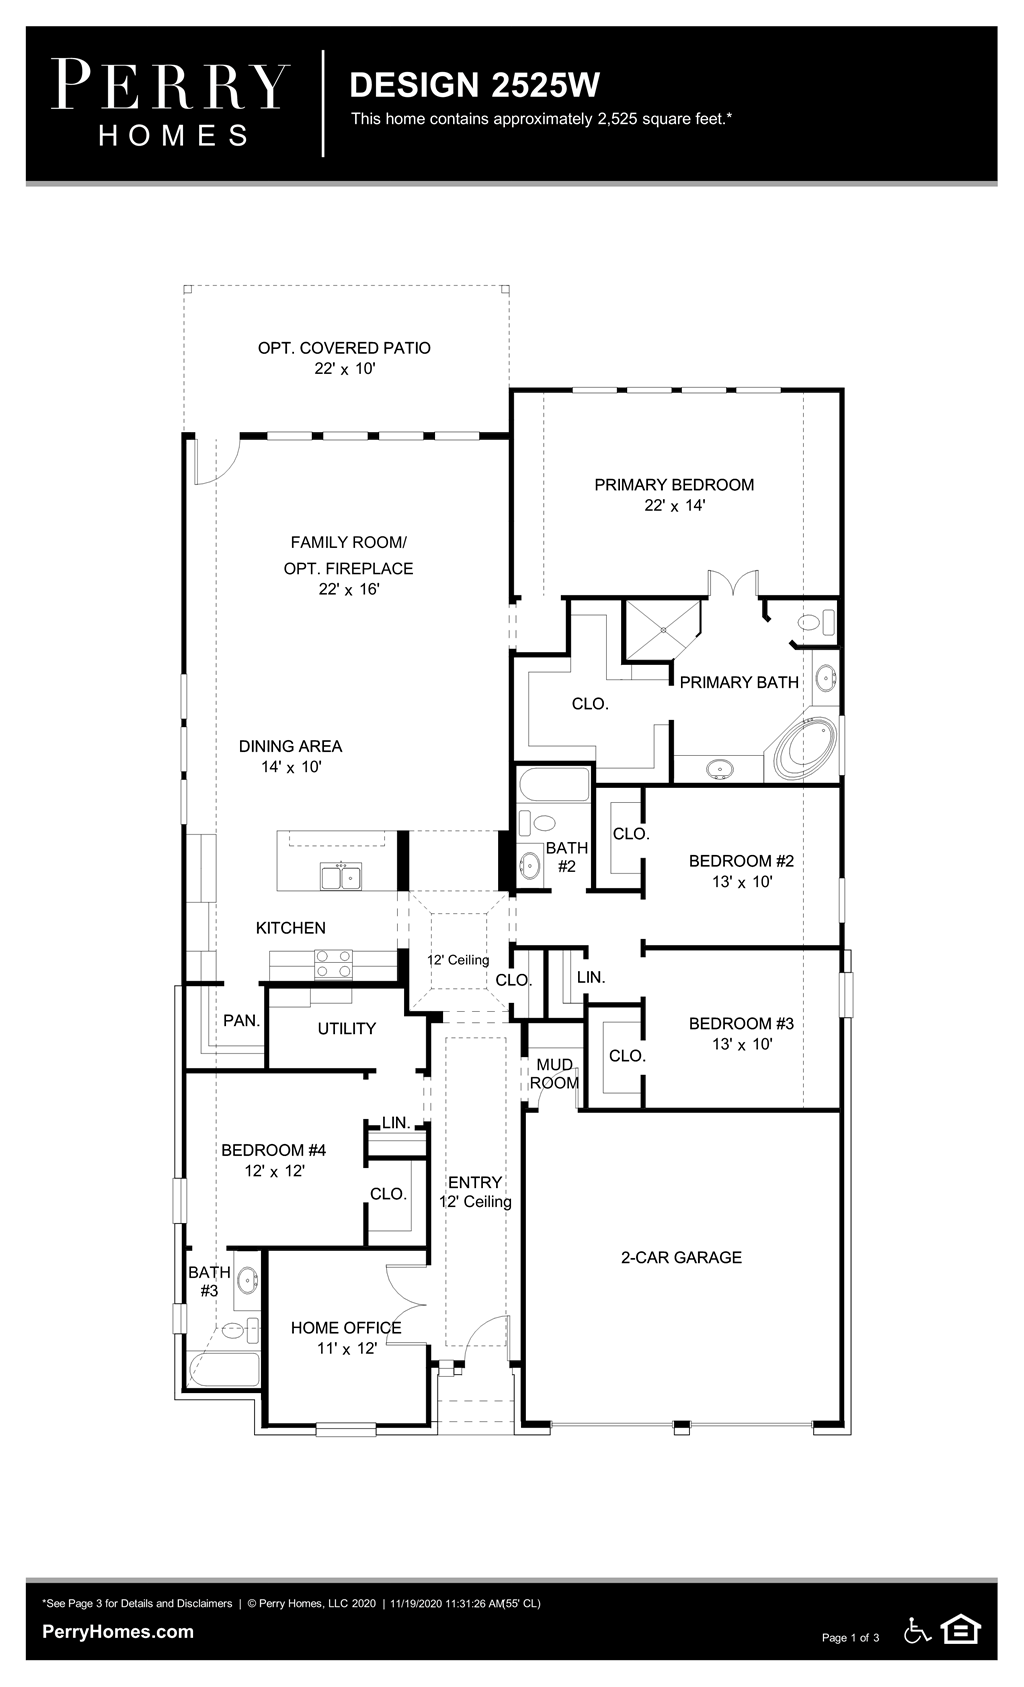 Floor Plan for 2525W